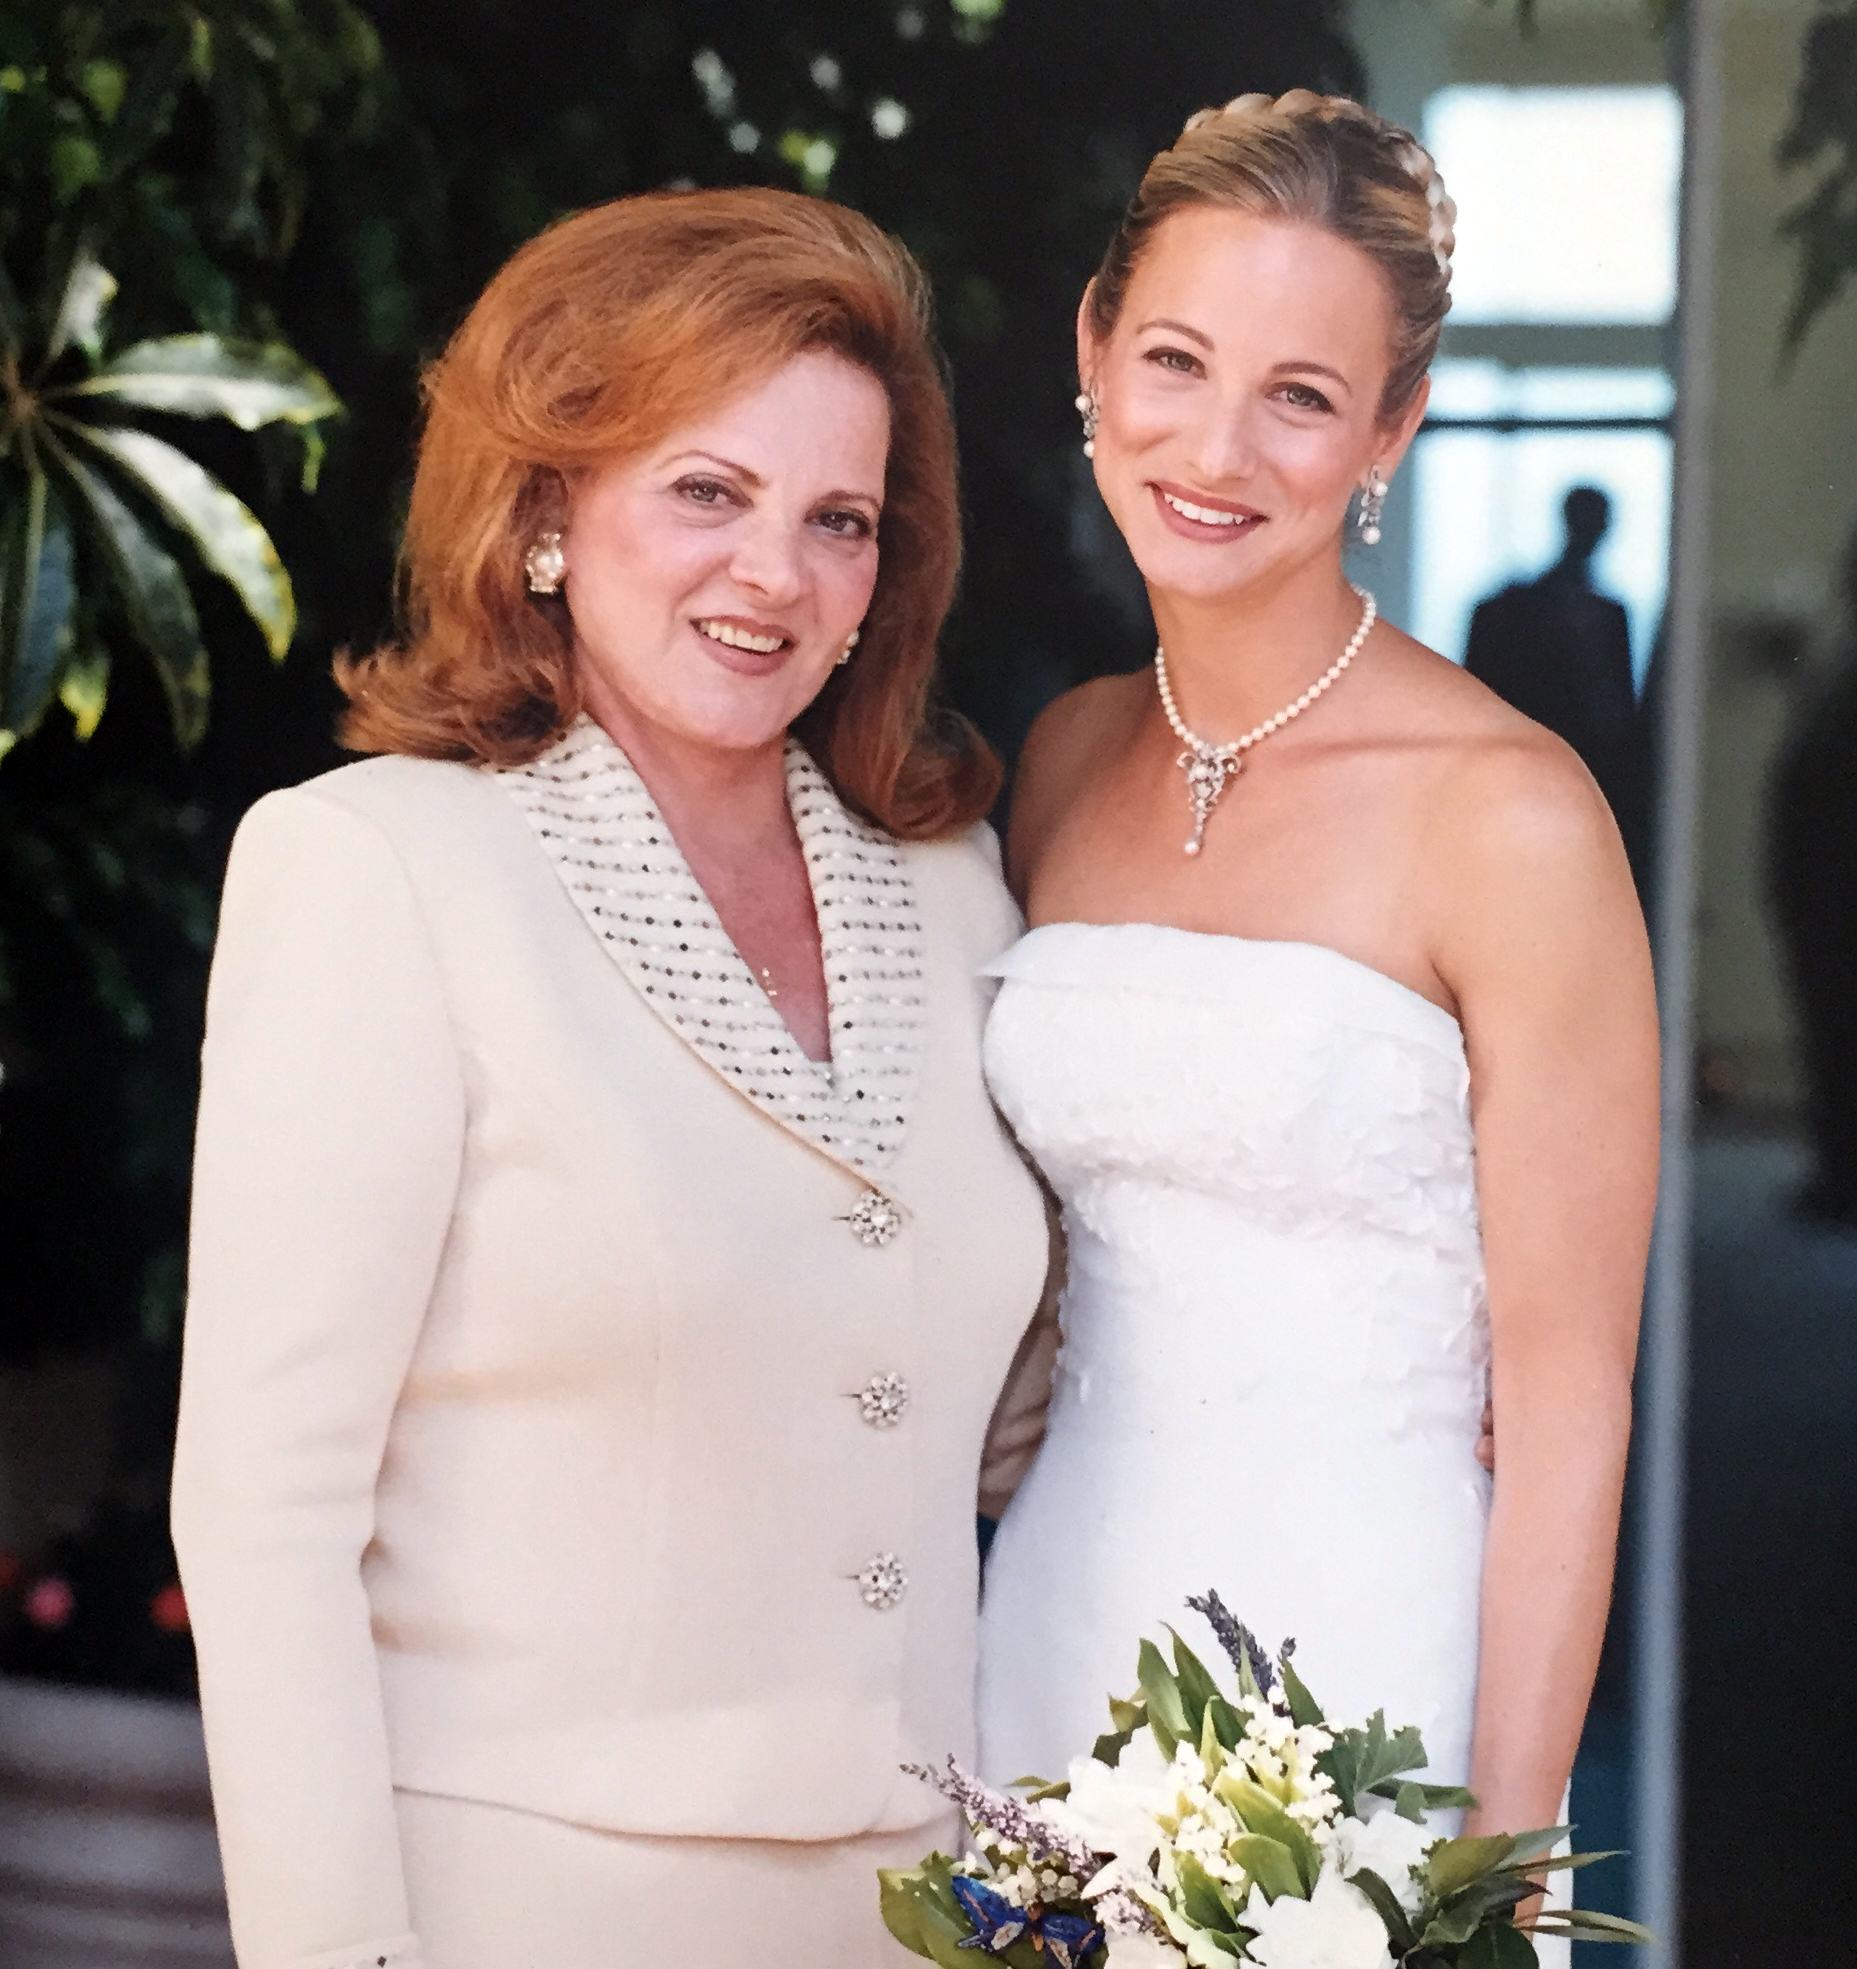 wedding day 2001